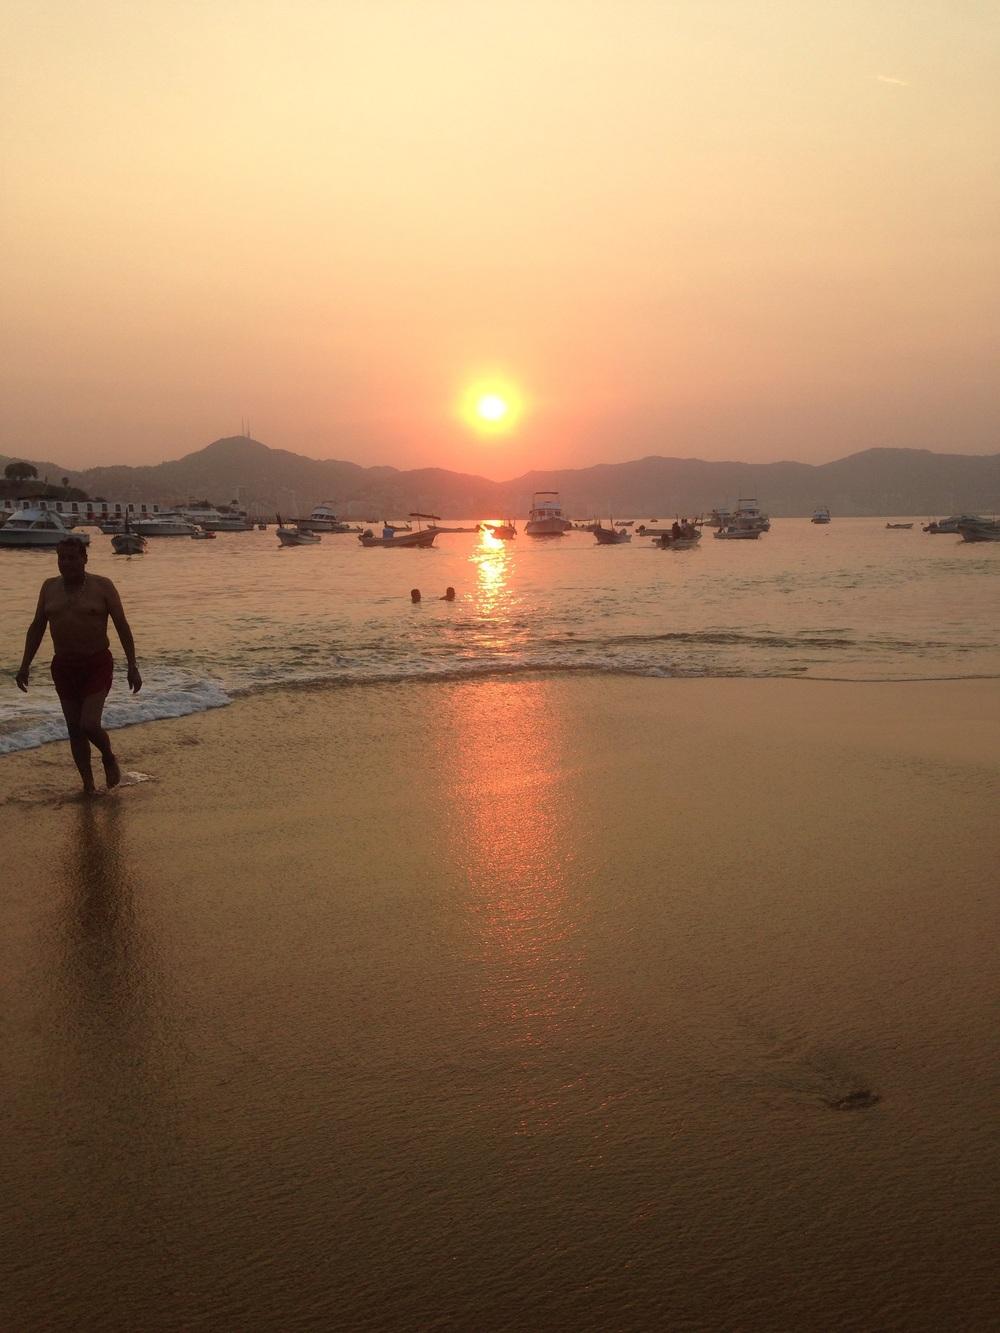 Swam at sunrise both mornings